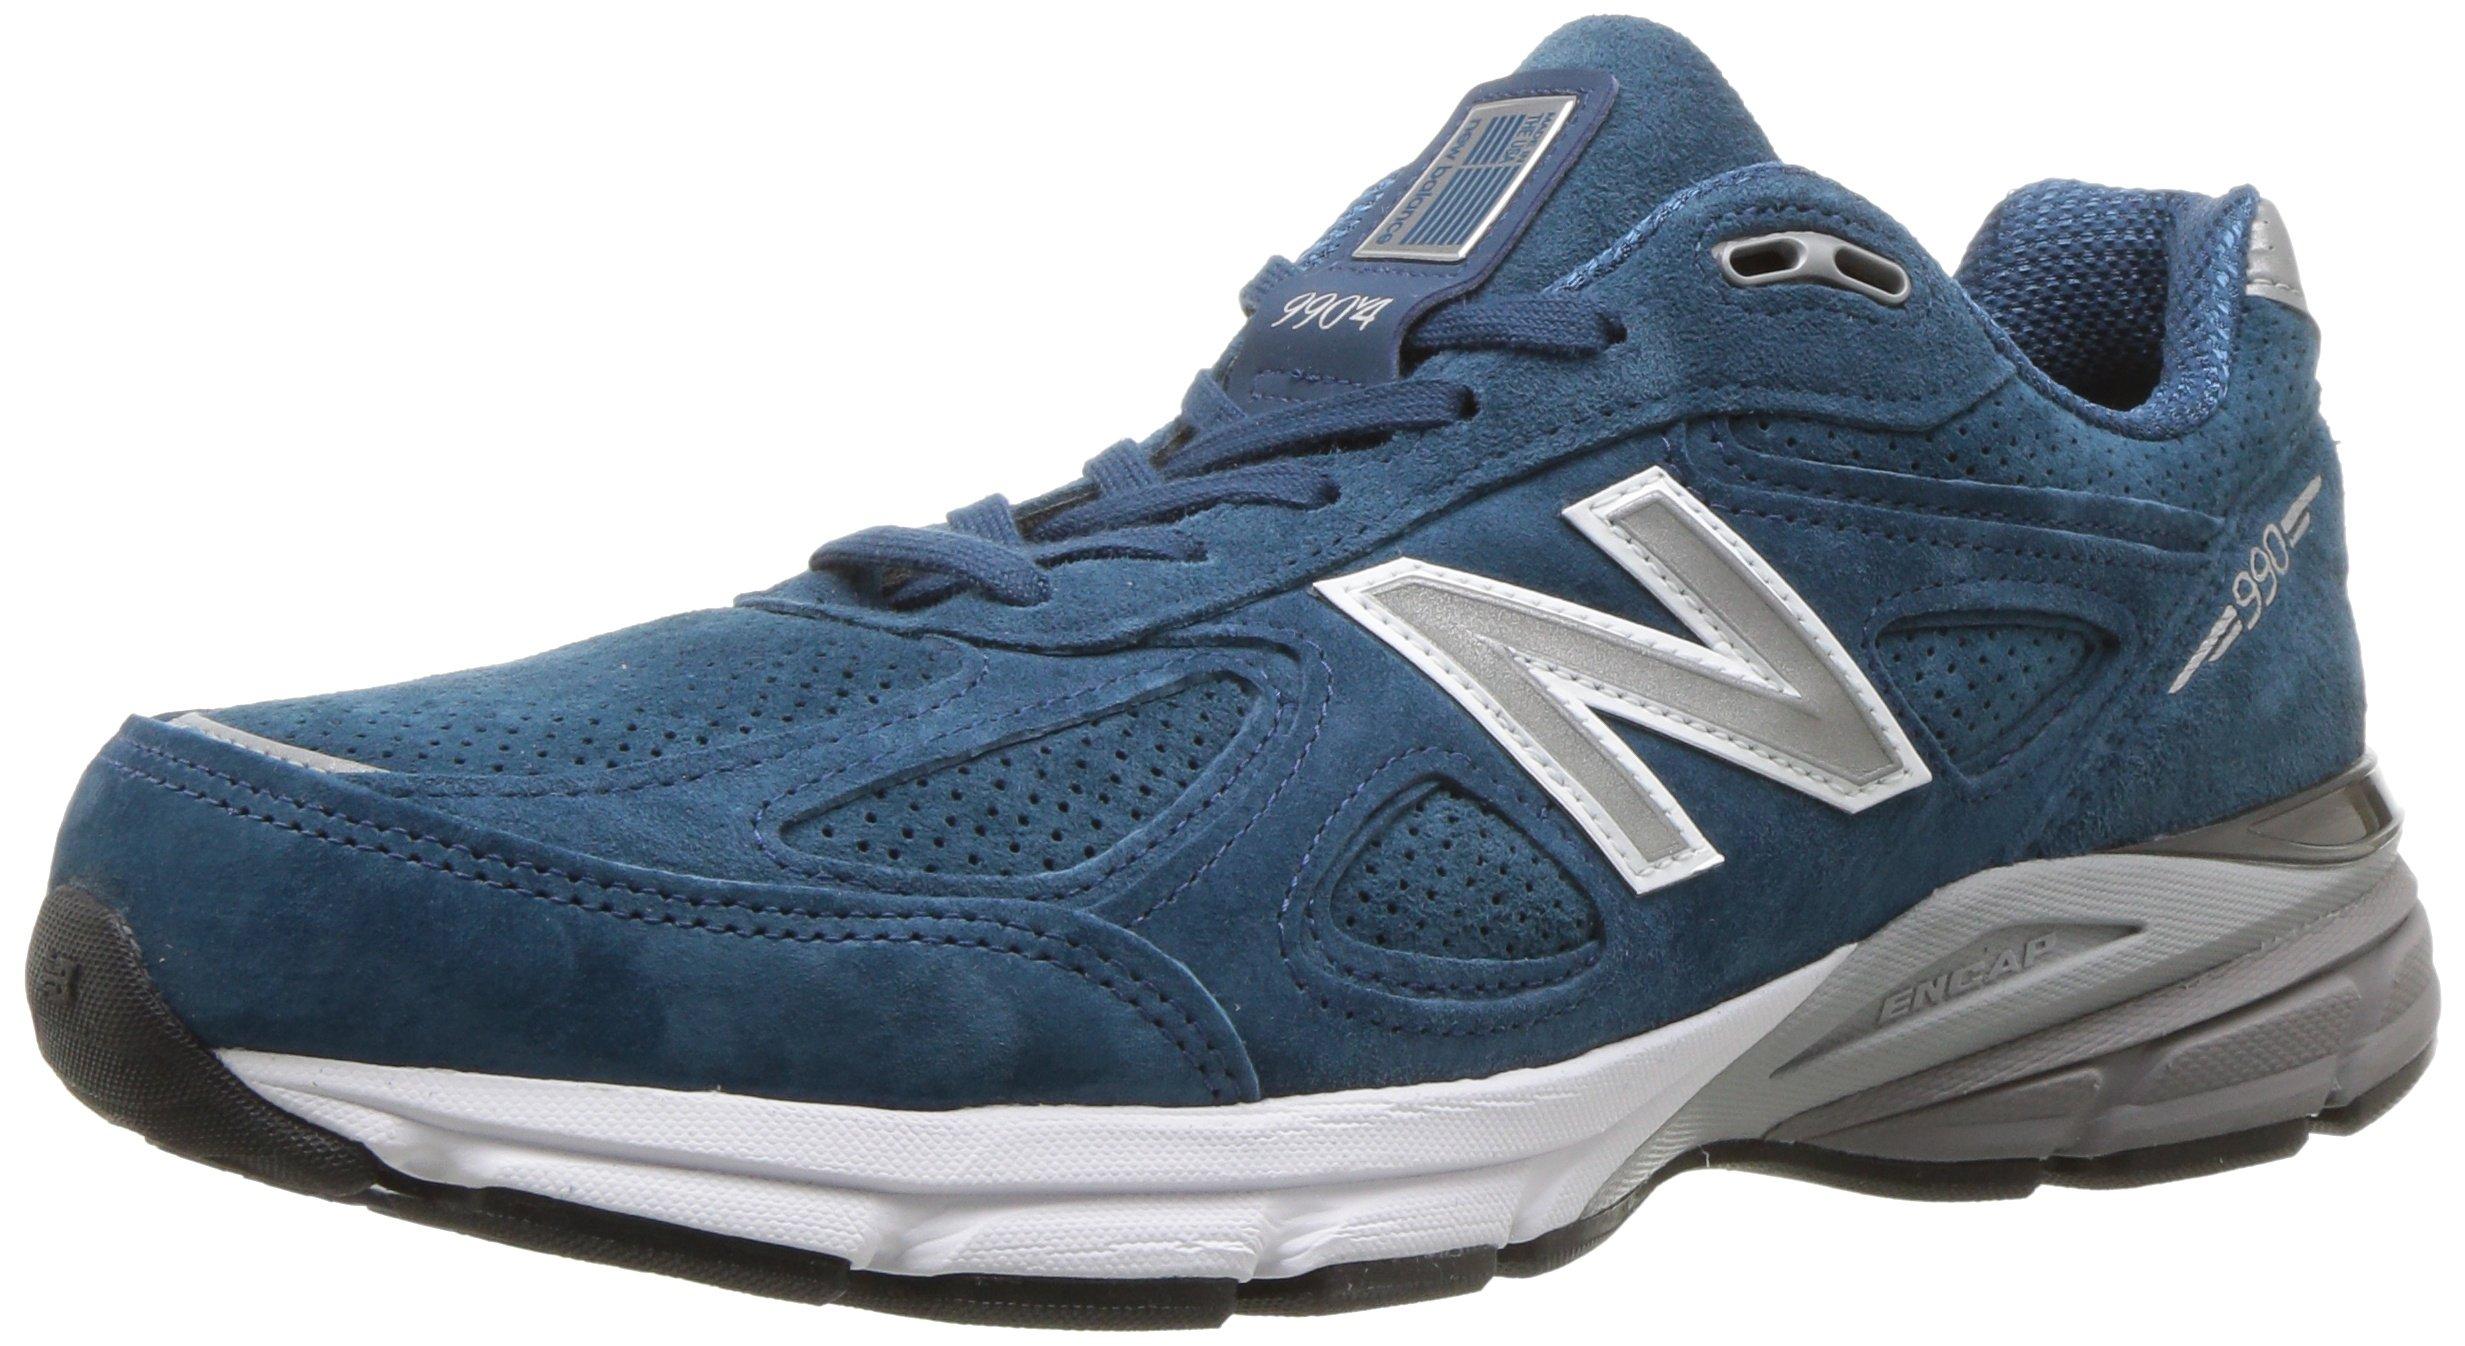 New Balance Men's 990v4 Running Shoe, North Sea/White, 7 D US